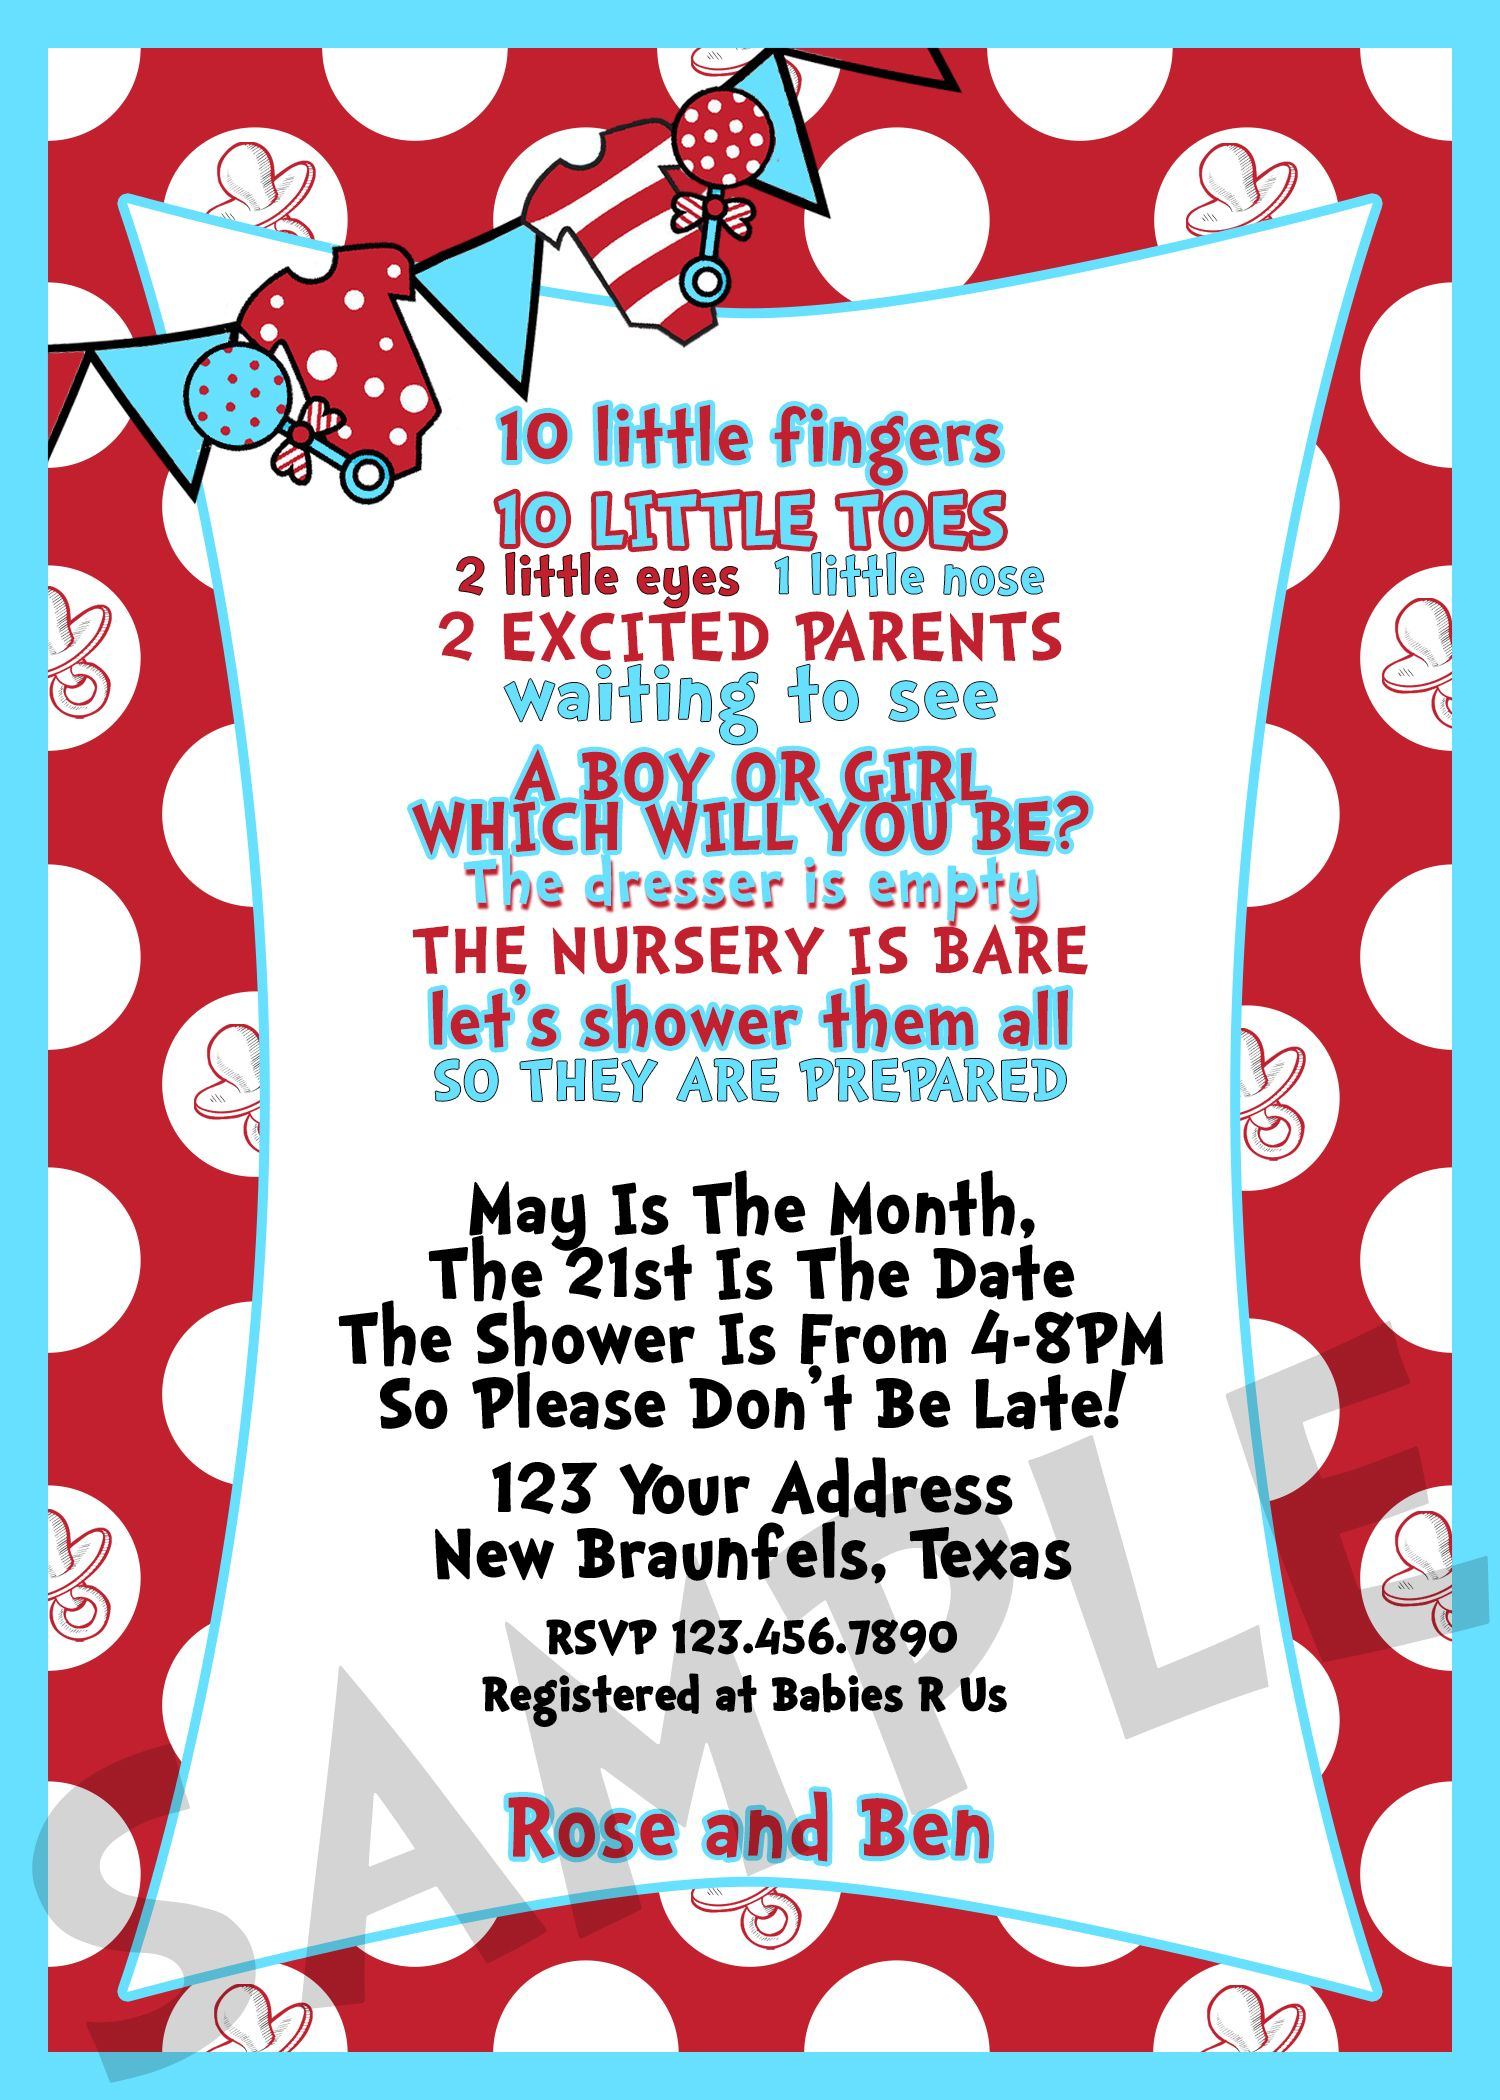 Dr Seuss Baby Shower Invitation 5x7 Facebook.com/pixelsbychrystal